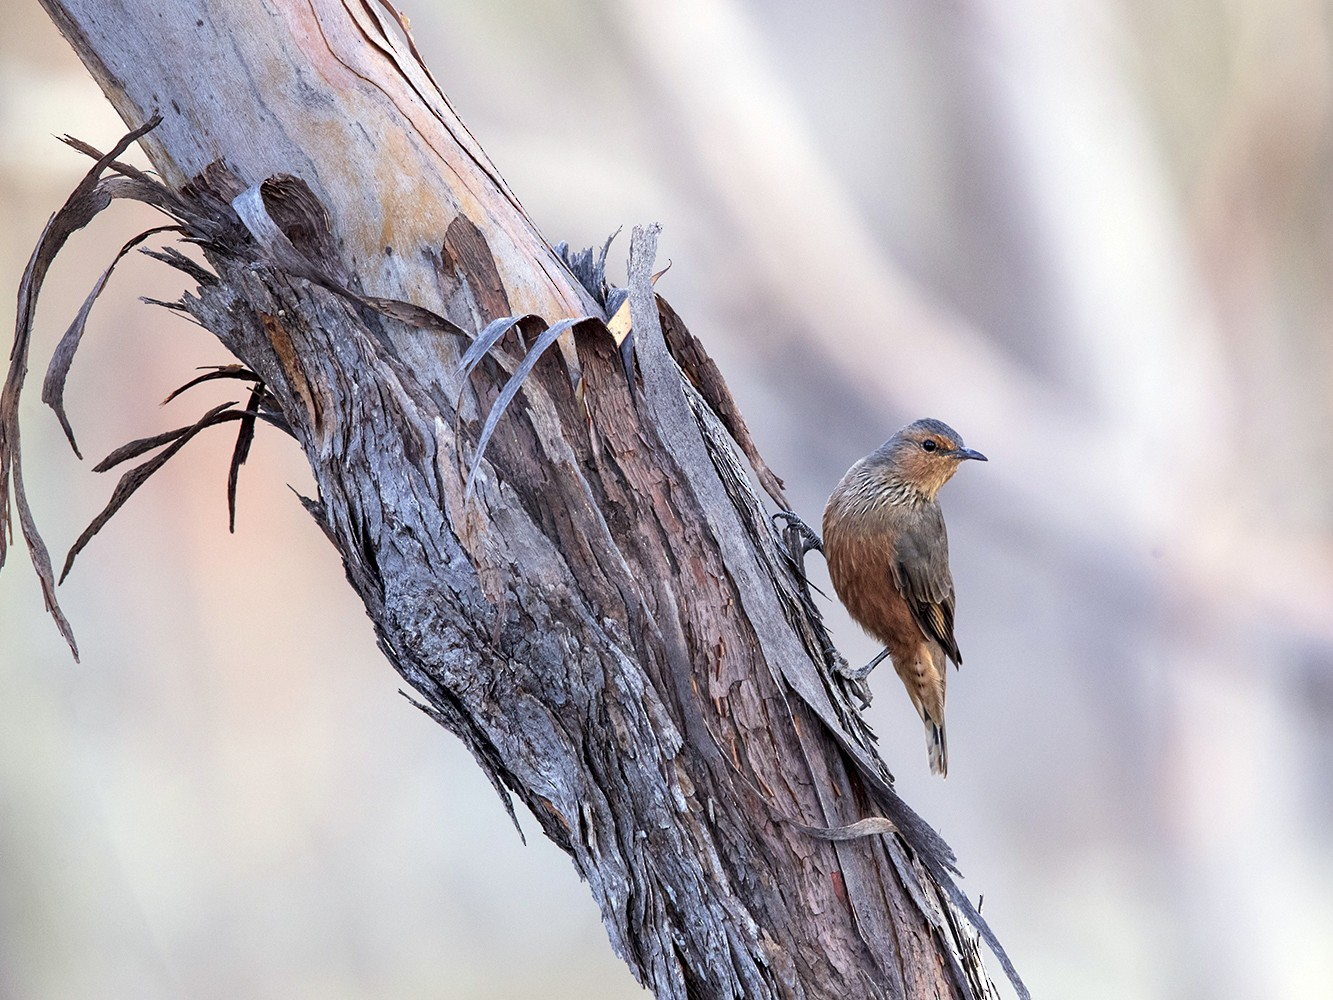 Rufous Treecreeper - Laurie Ross | Tracks Birding & Photography Tours